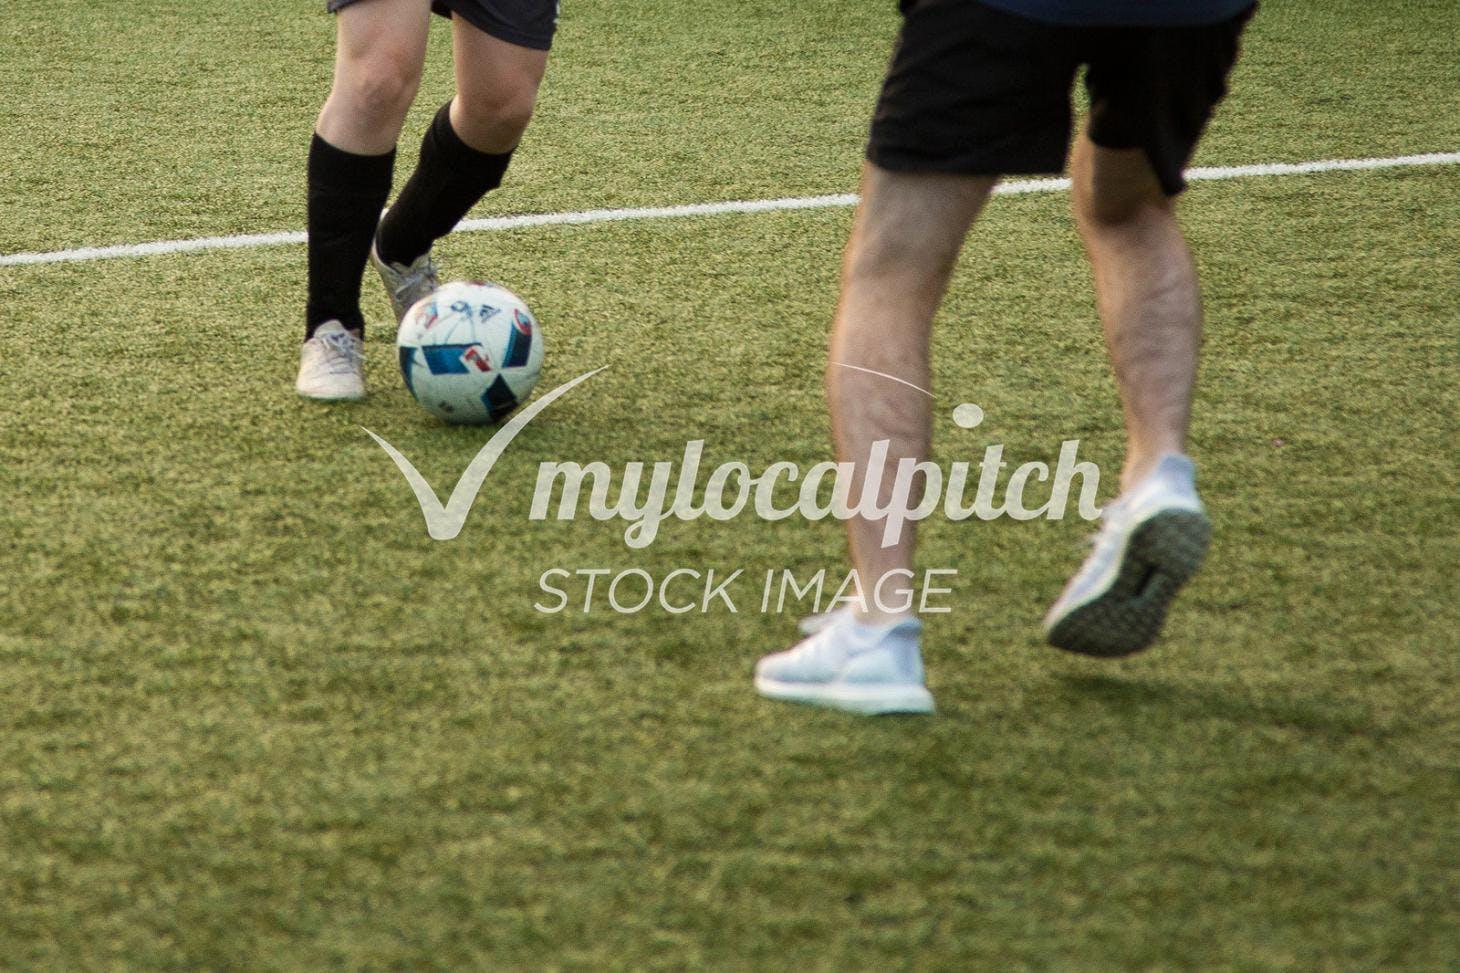 Longfield Academy 11 a side | Grass football pitch